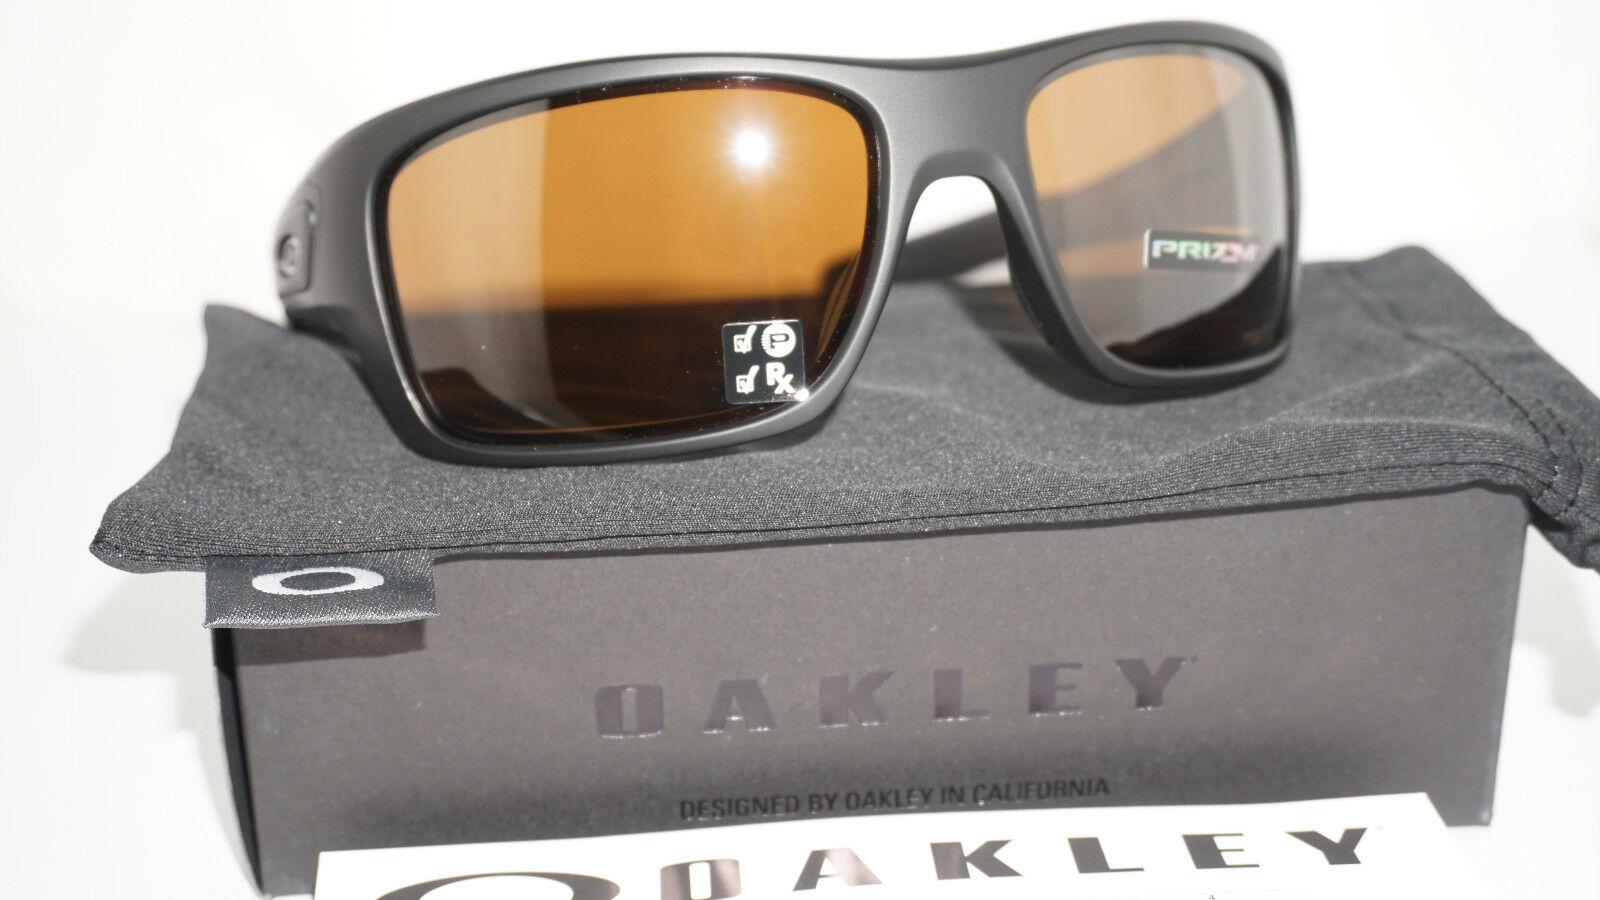 oakley欧克利太阳turbine林地眼镜1148.00元包邮